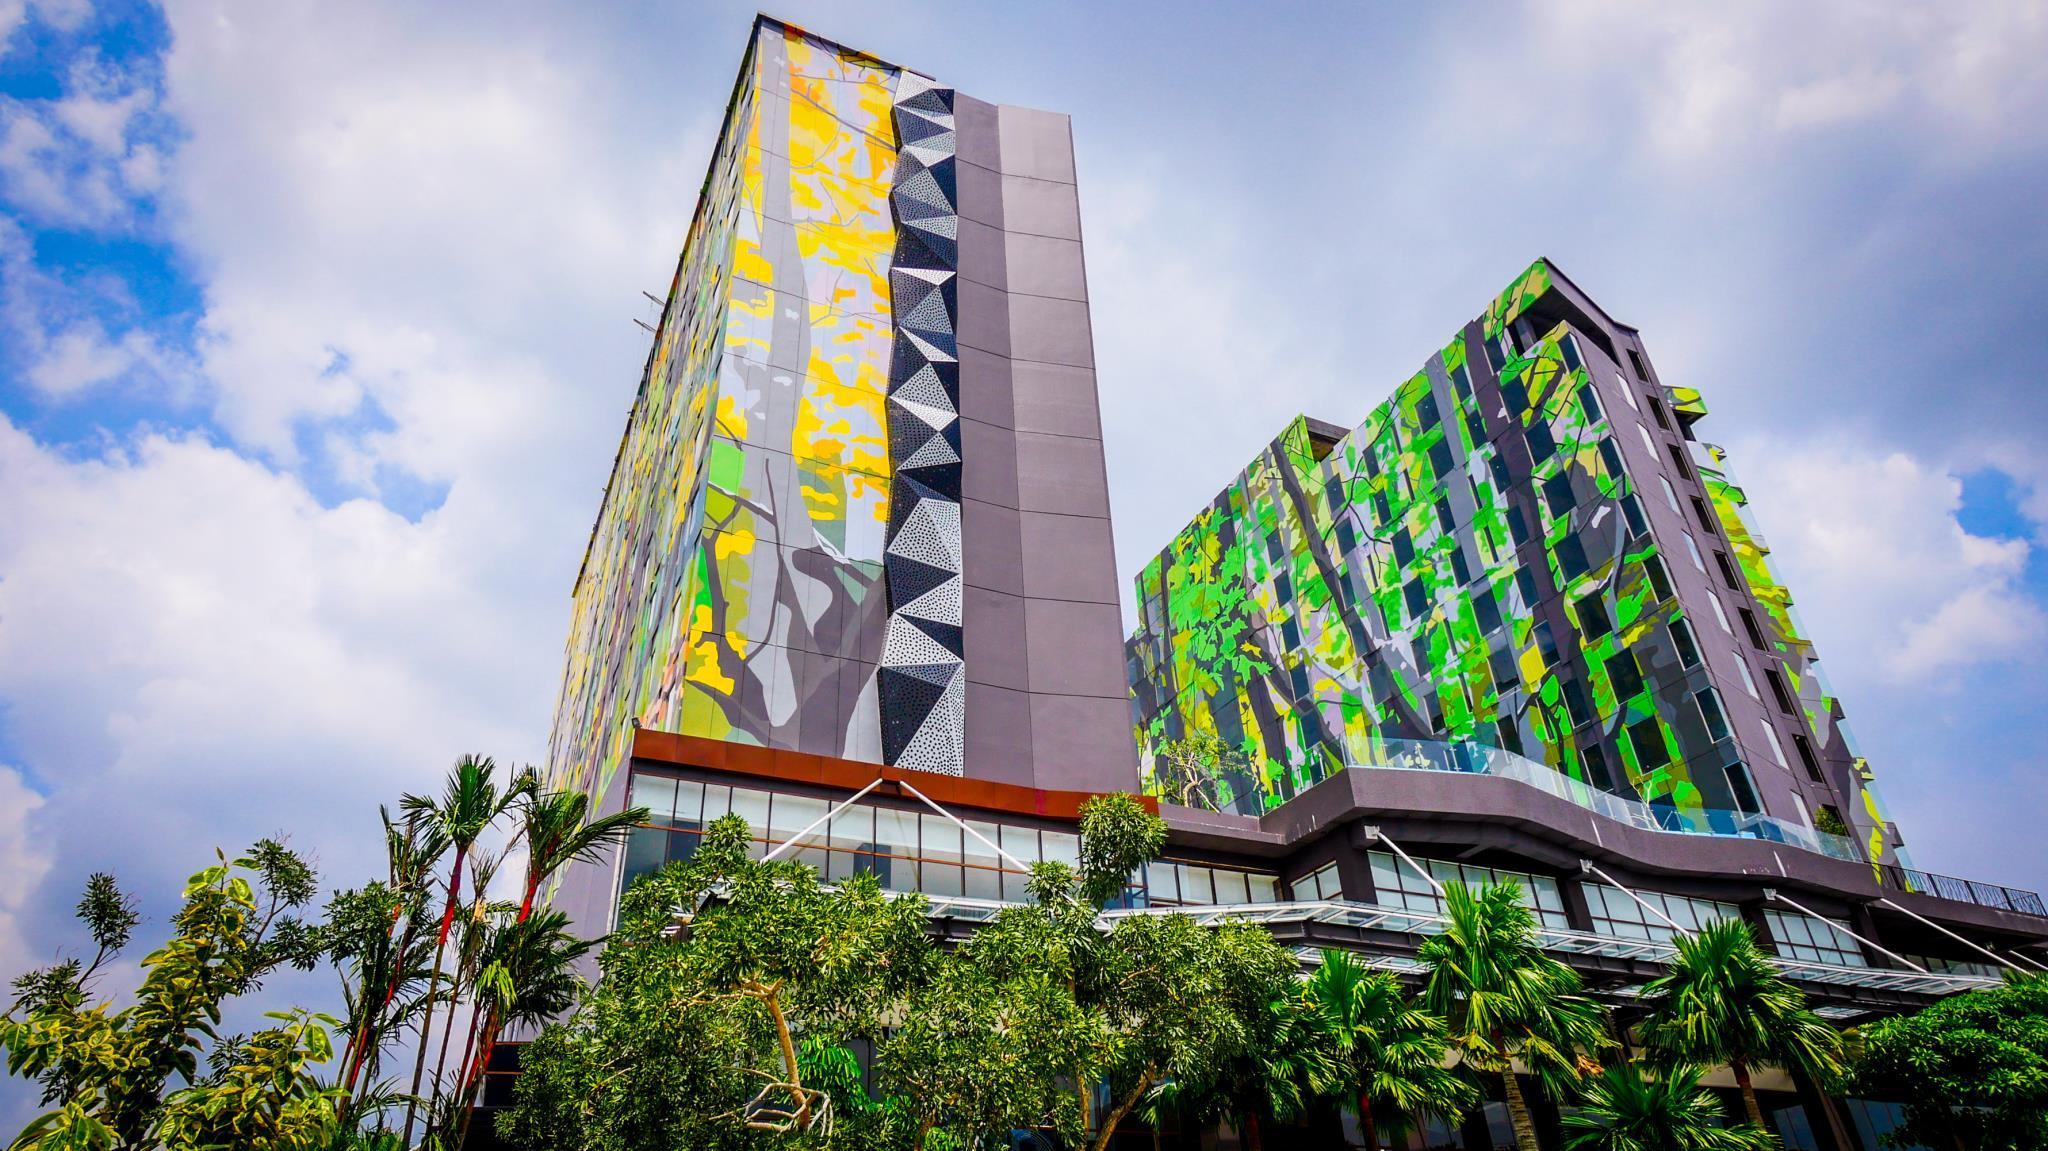 Golden Tulip Essential Hotel Airport Pekanbaru, Pekanbaru